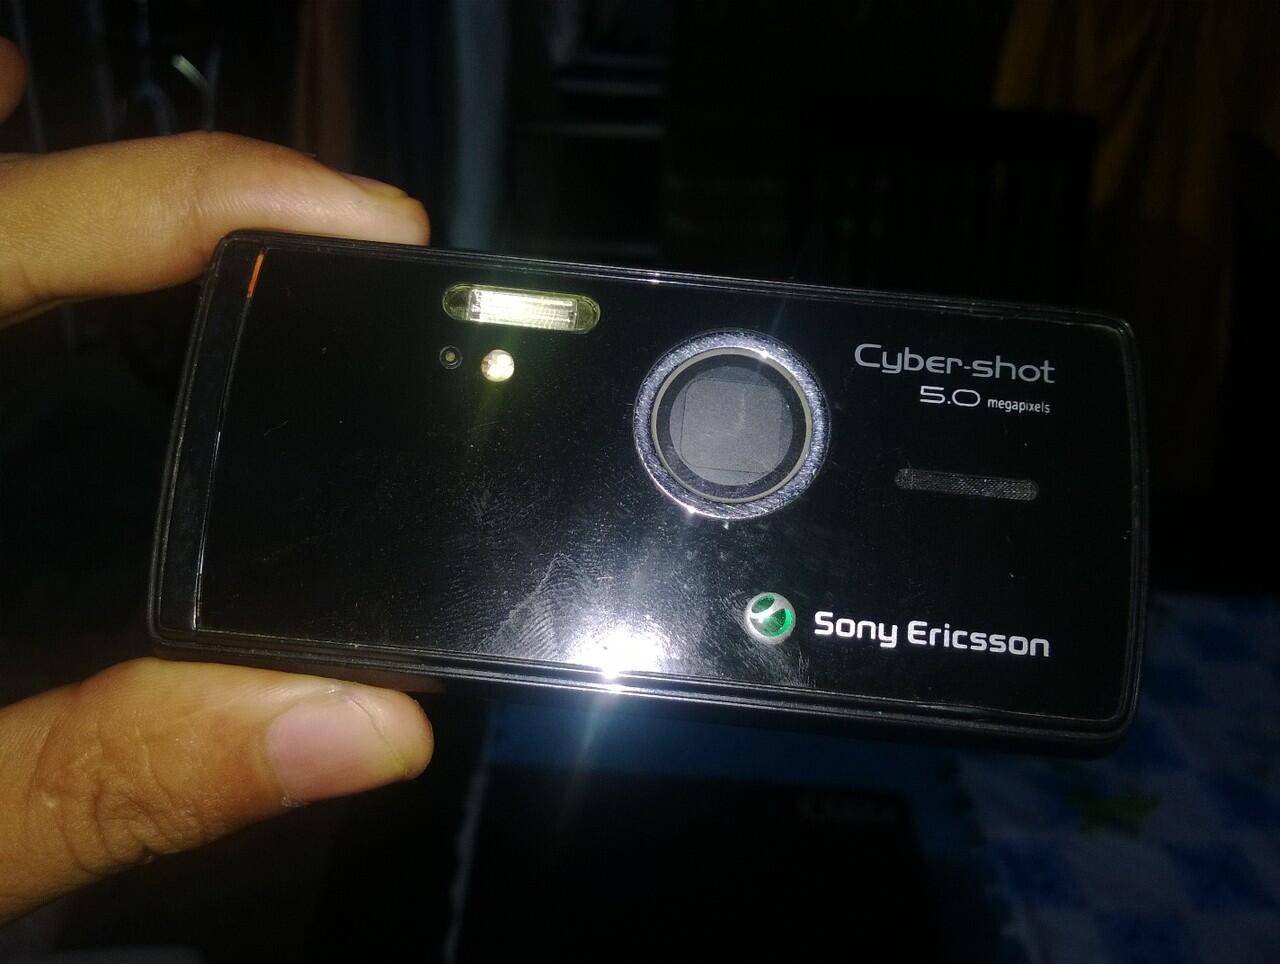 [WTS] HP JADUL LANGKA K850I HARUS GANTI LCD, FISIK DAN FUNGSI OKE